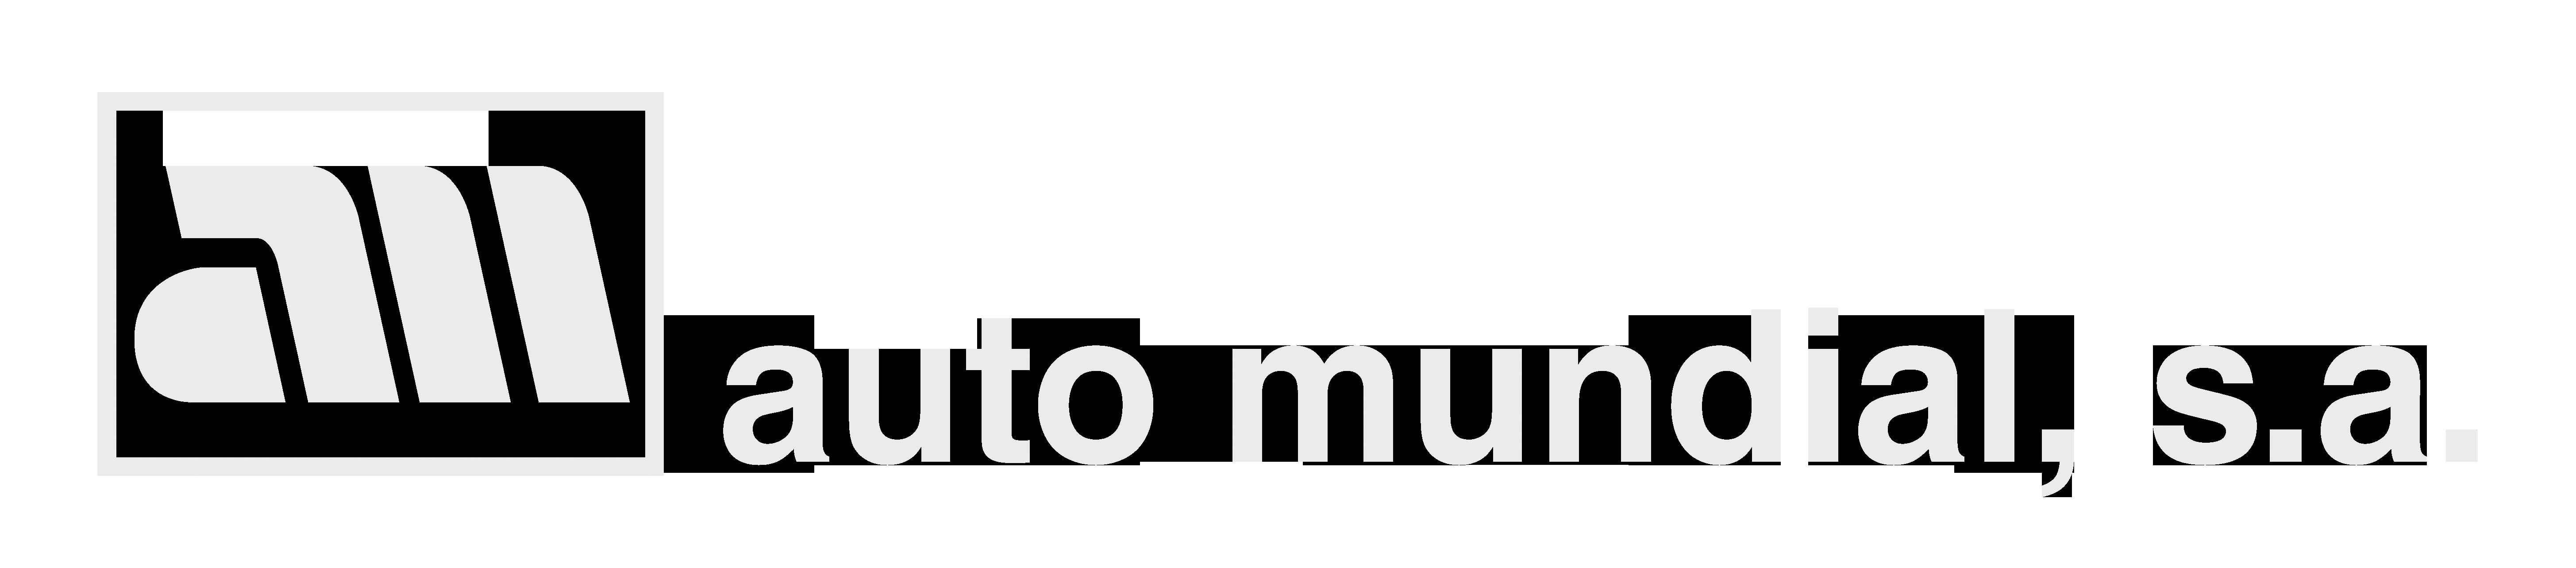 AutoMundial